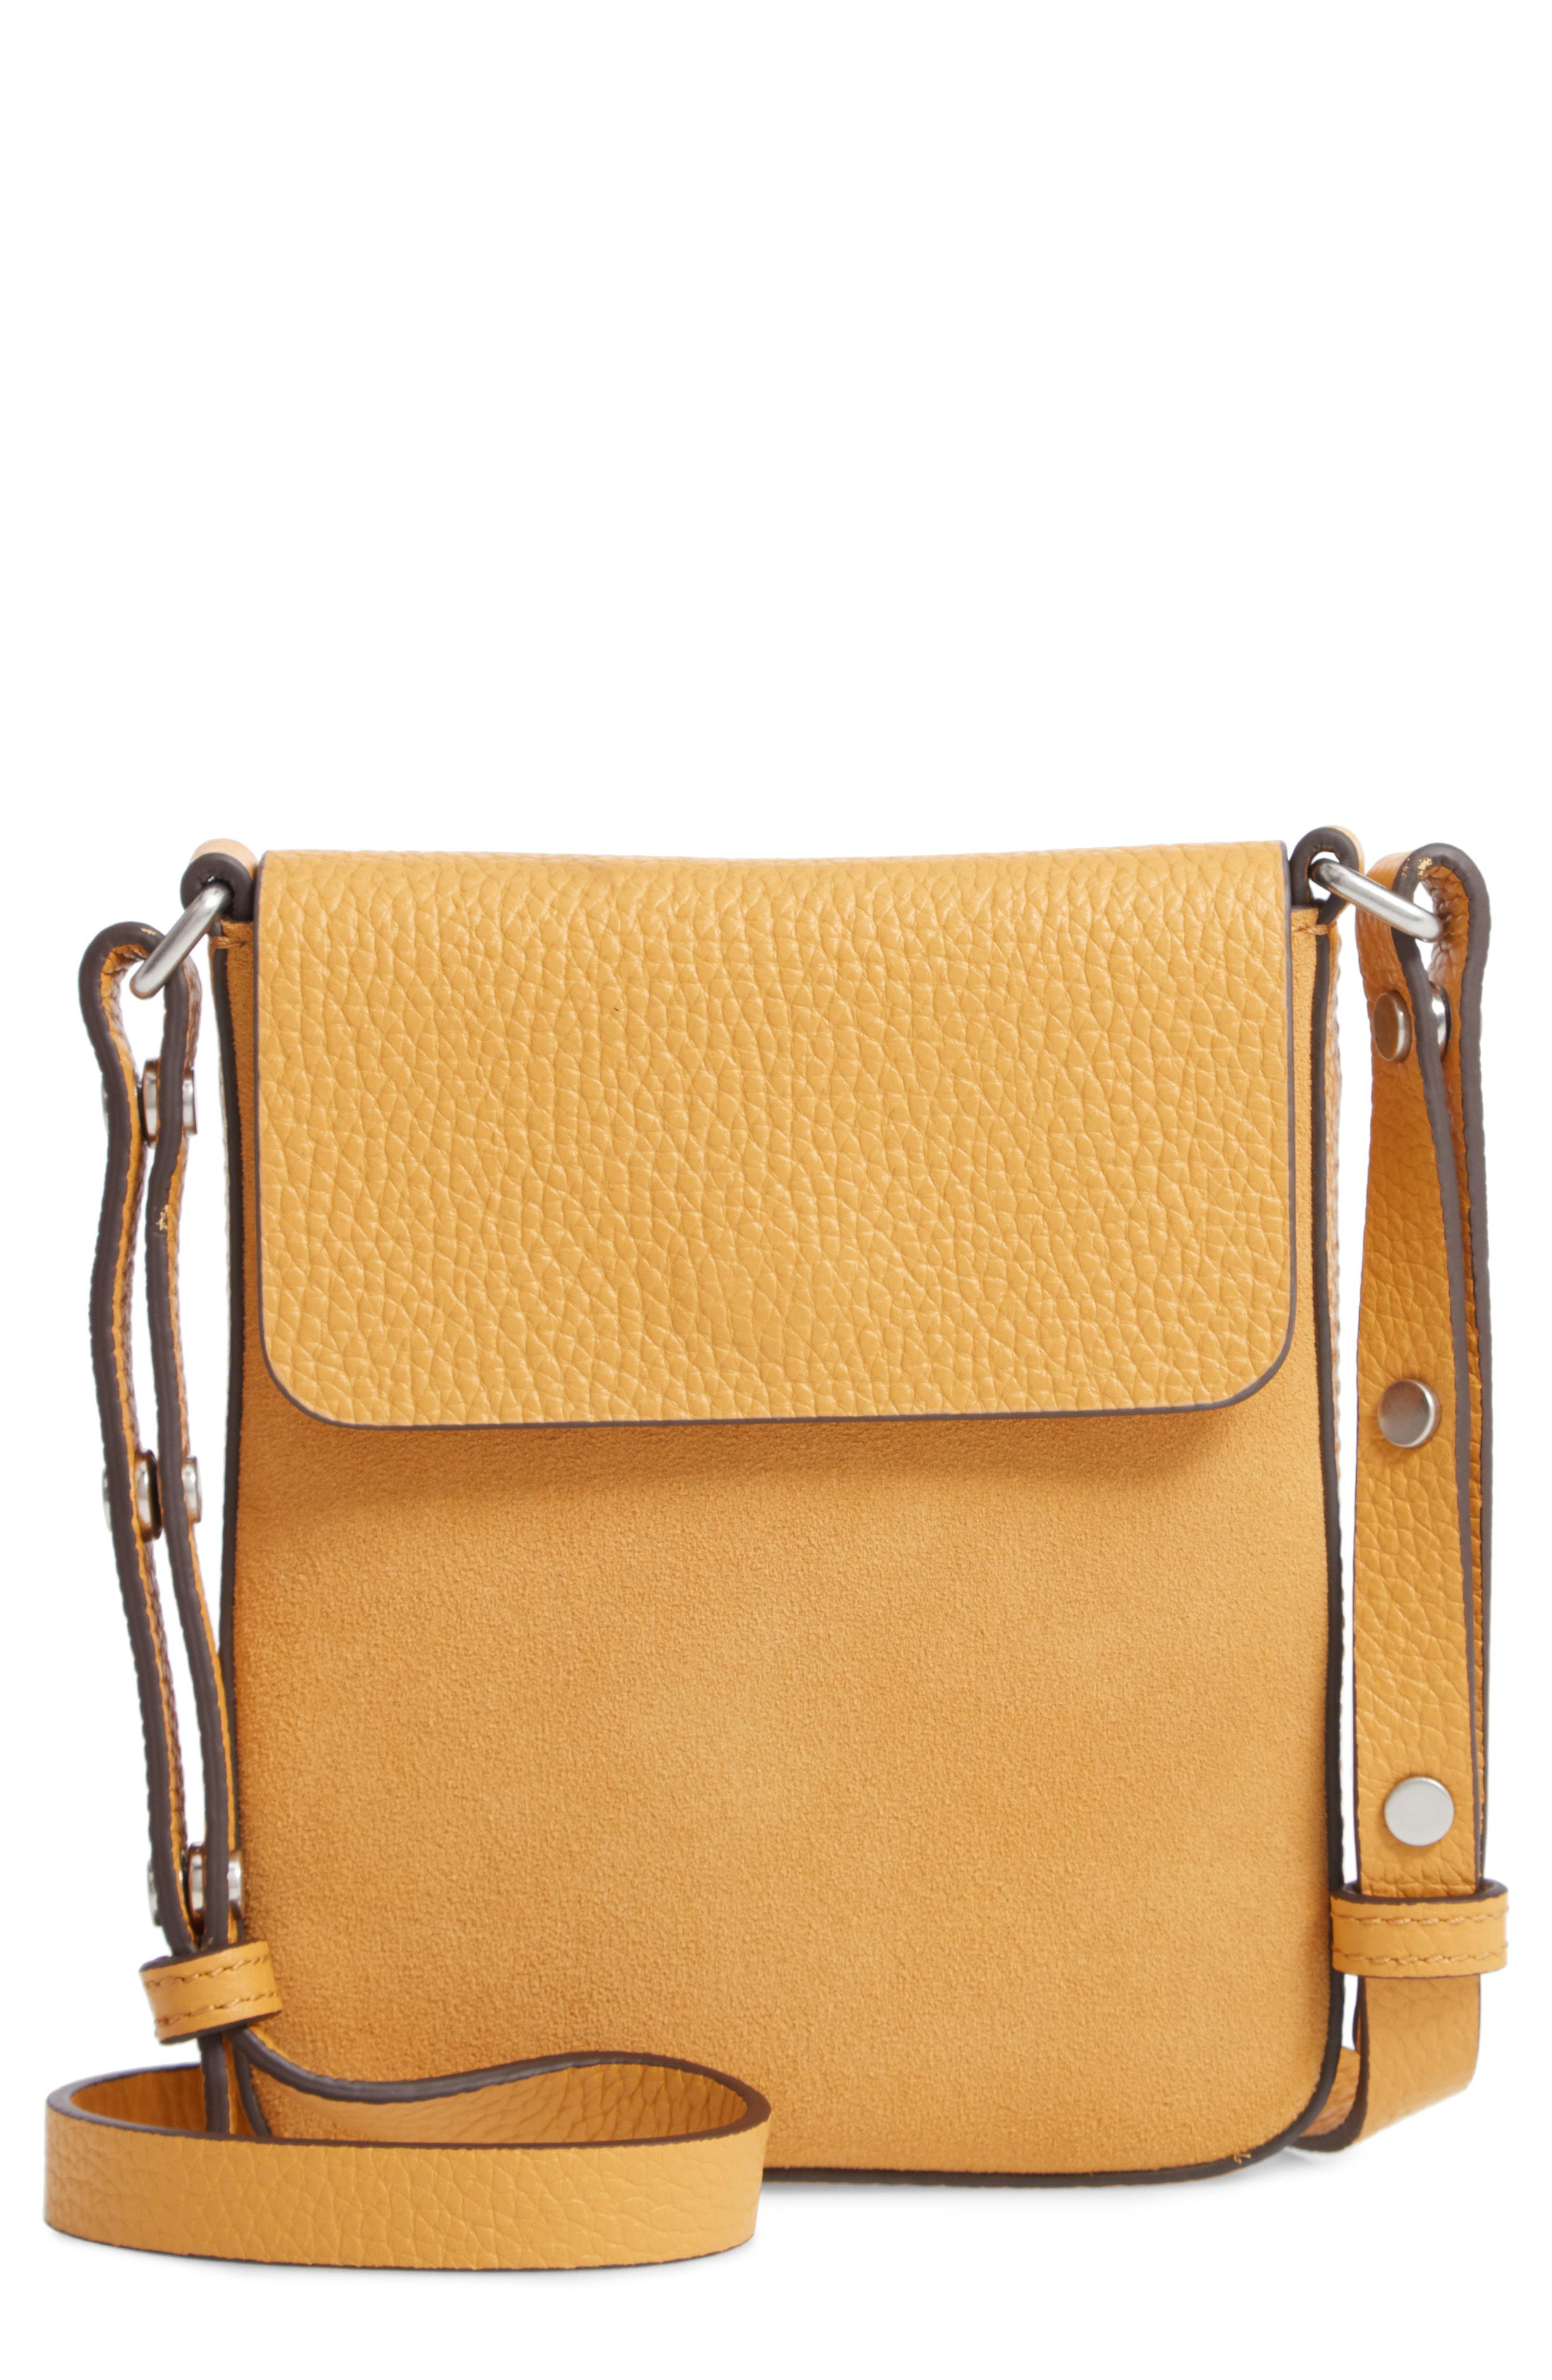 21a69572844f Treasure & Bond Madison Leather Crossbody Bag - Lyst